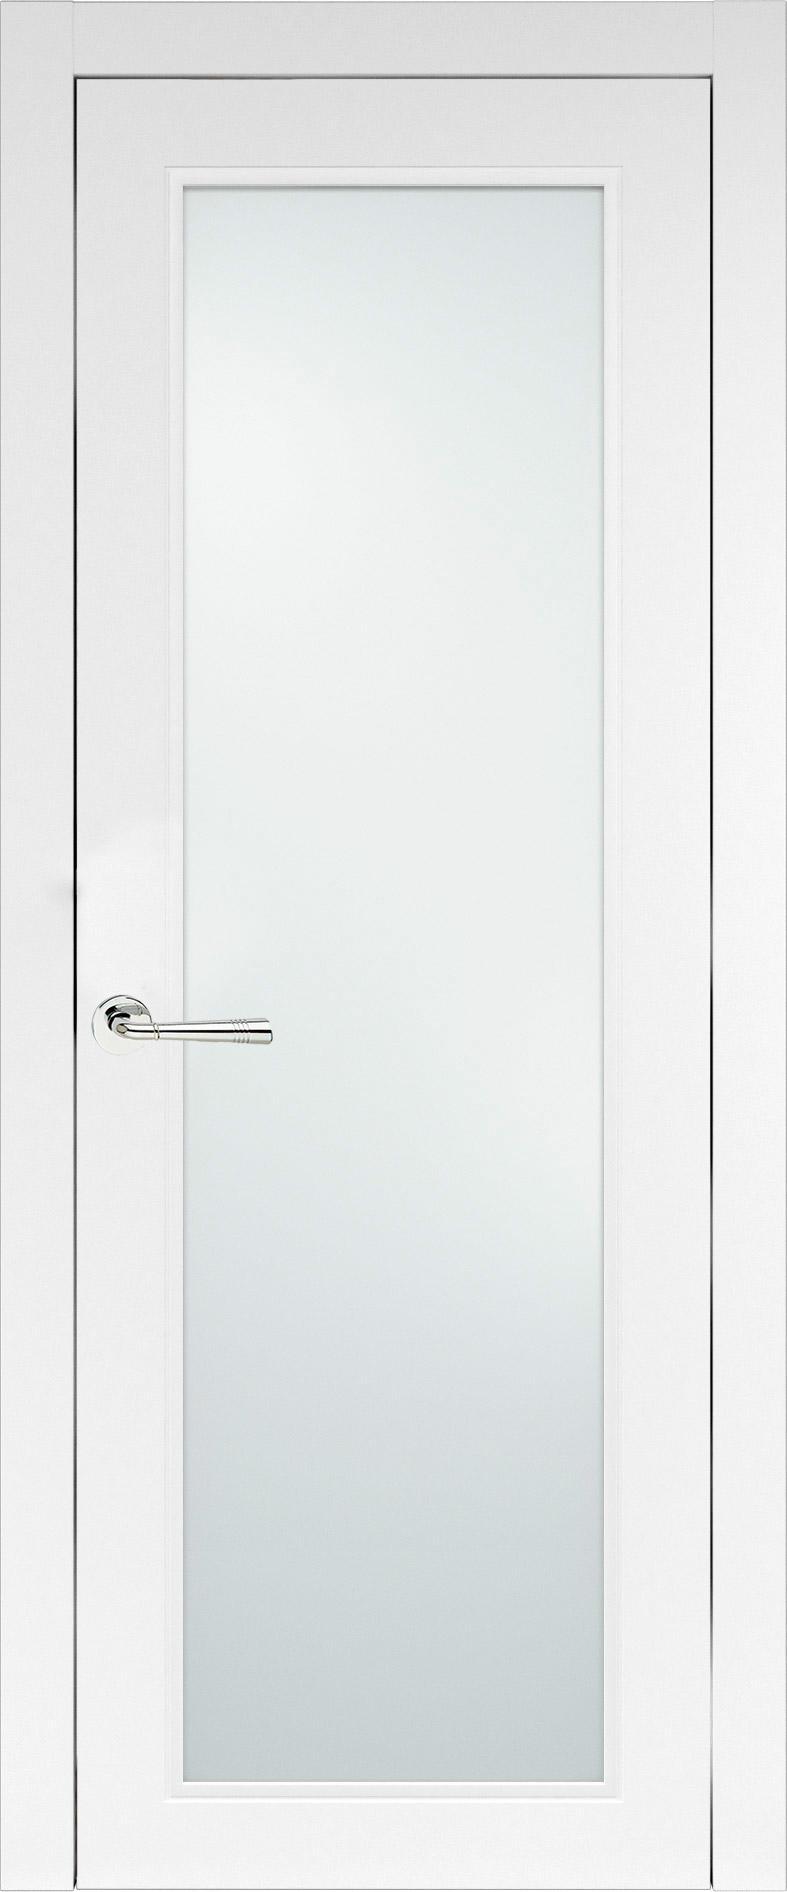 Domenica Neo Classic цвет - Белая эмаль (RAL 9003) Со стеклом (ДО)